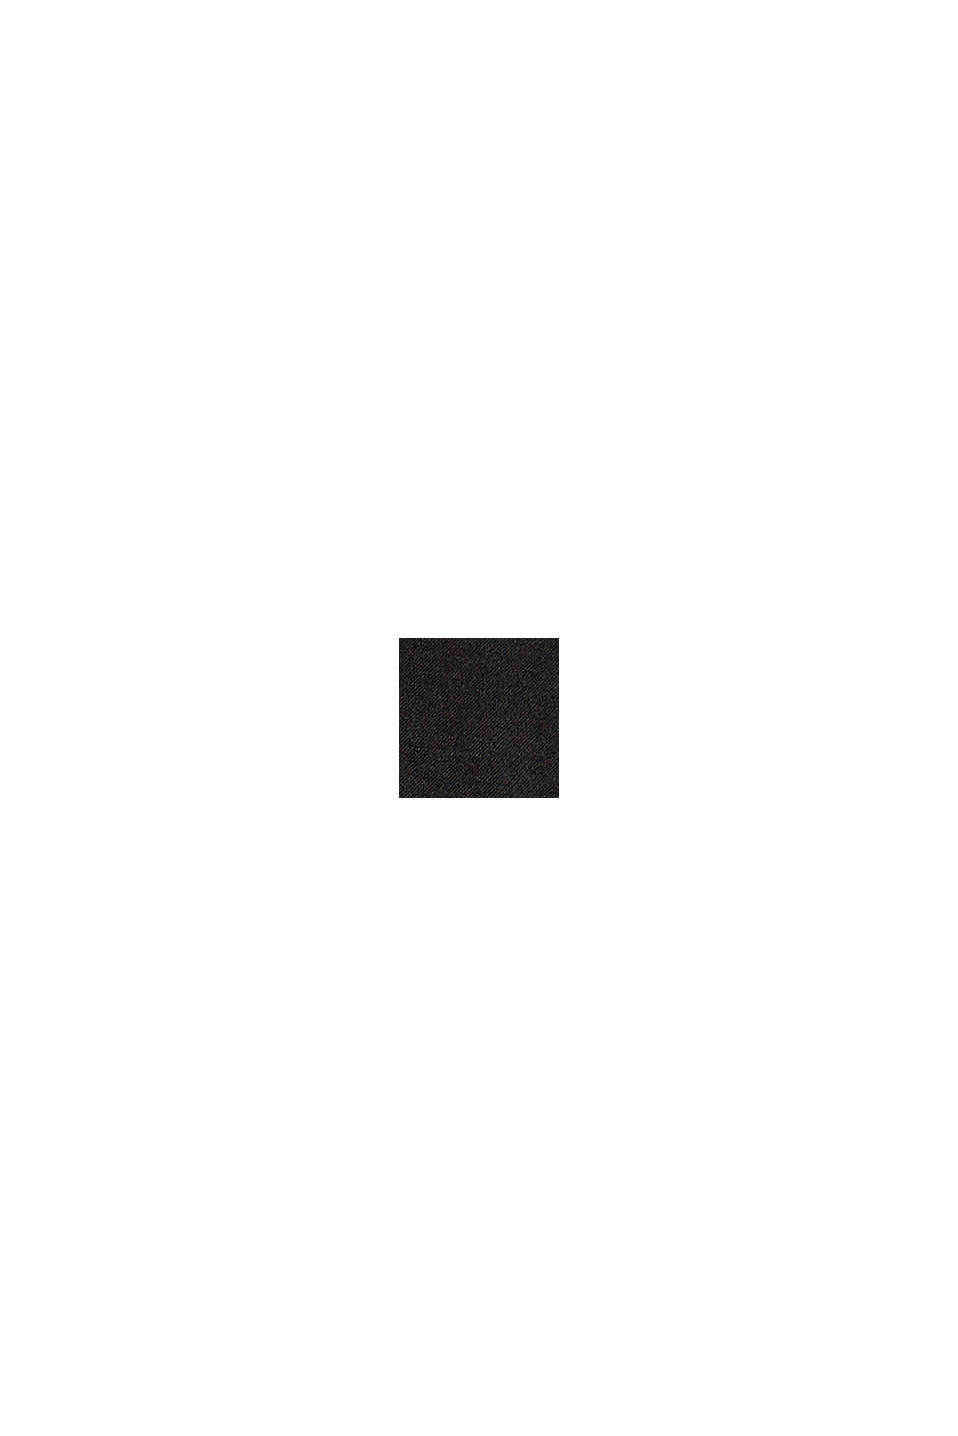 Con lana: gilet lungo, BLACK, swatch